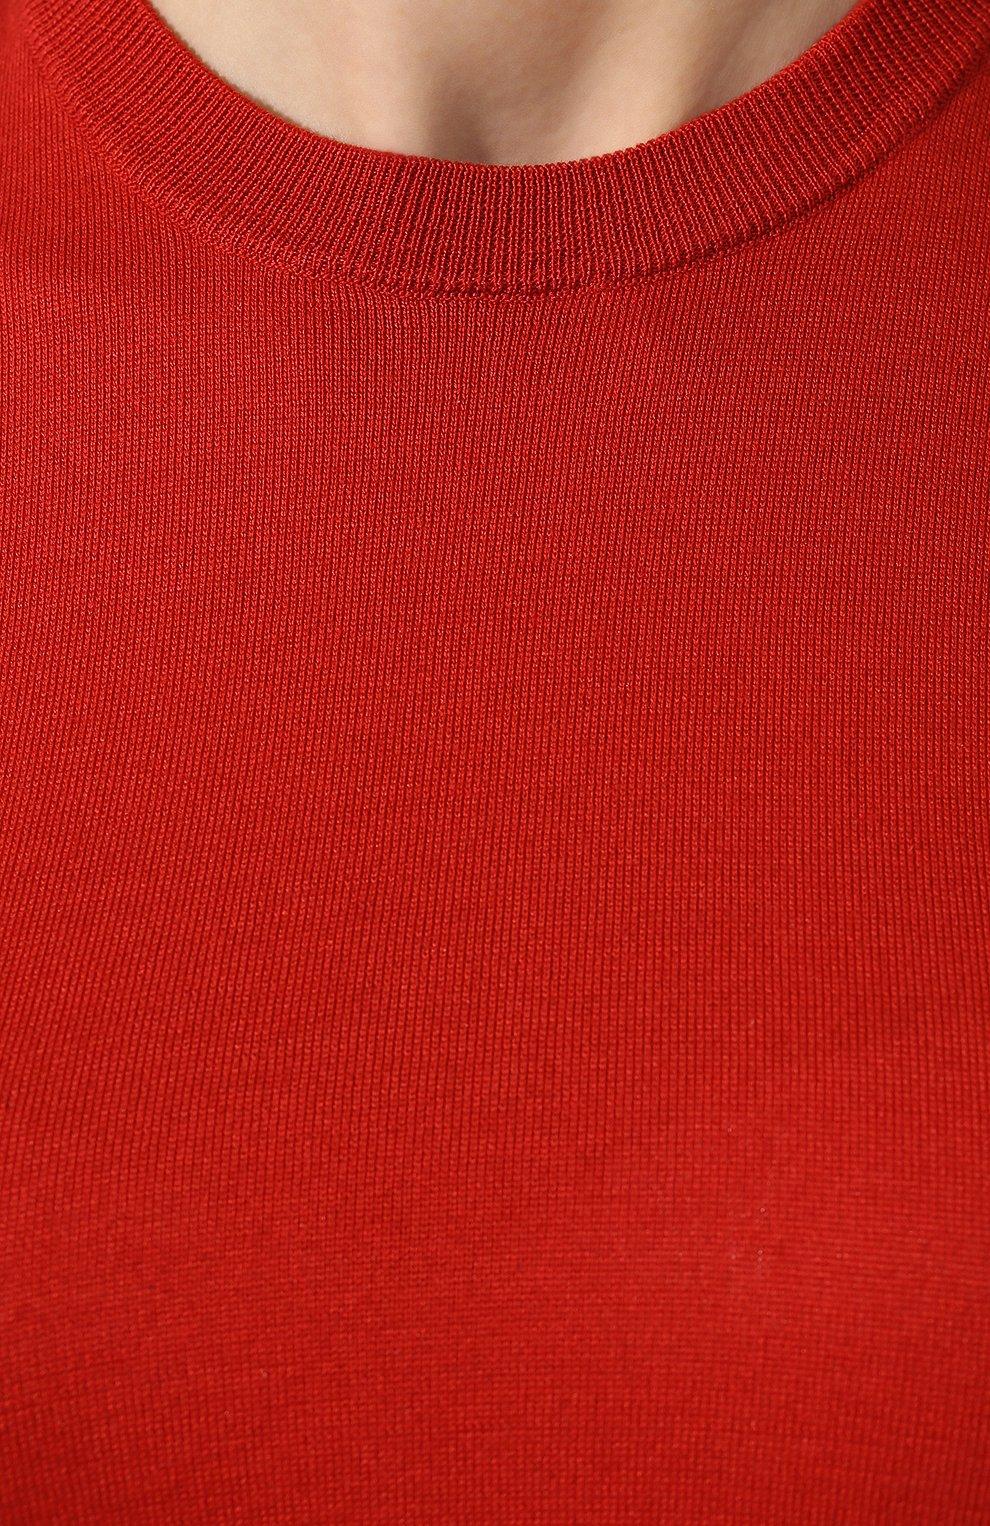 Женский топ из смеси шелка и хлопка LORO PIANA красного цвета, арт. FAI4414   Фото 5